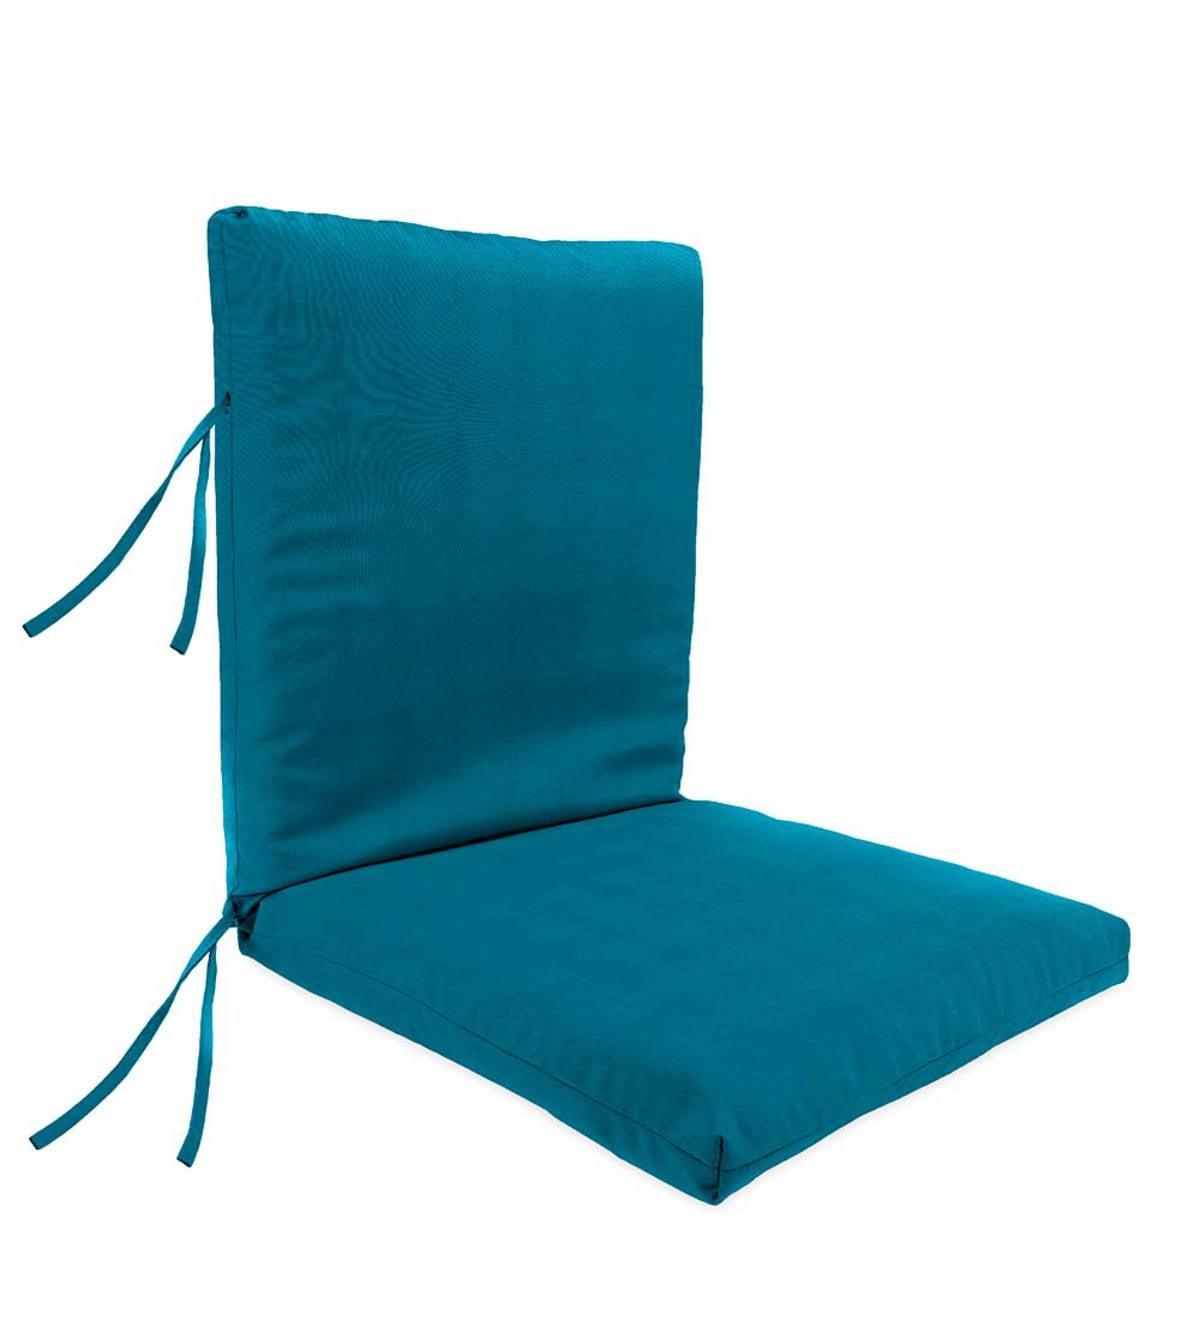 Sunbrella® Classic Large Club Chair Cushion With Ties, 44u201dx 22u201dwith